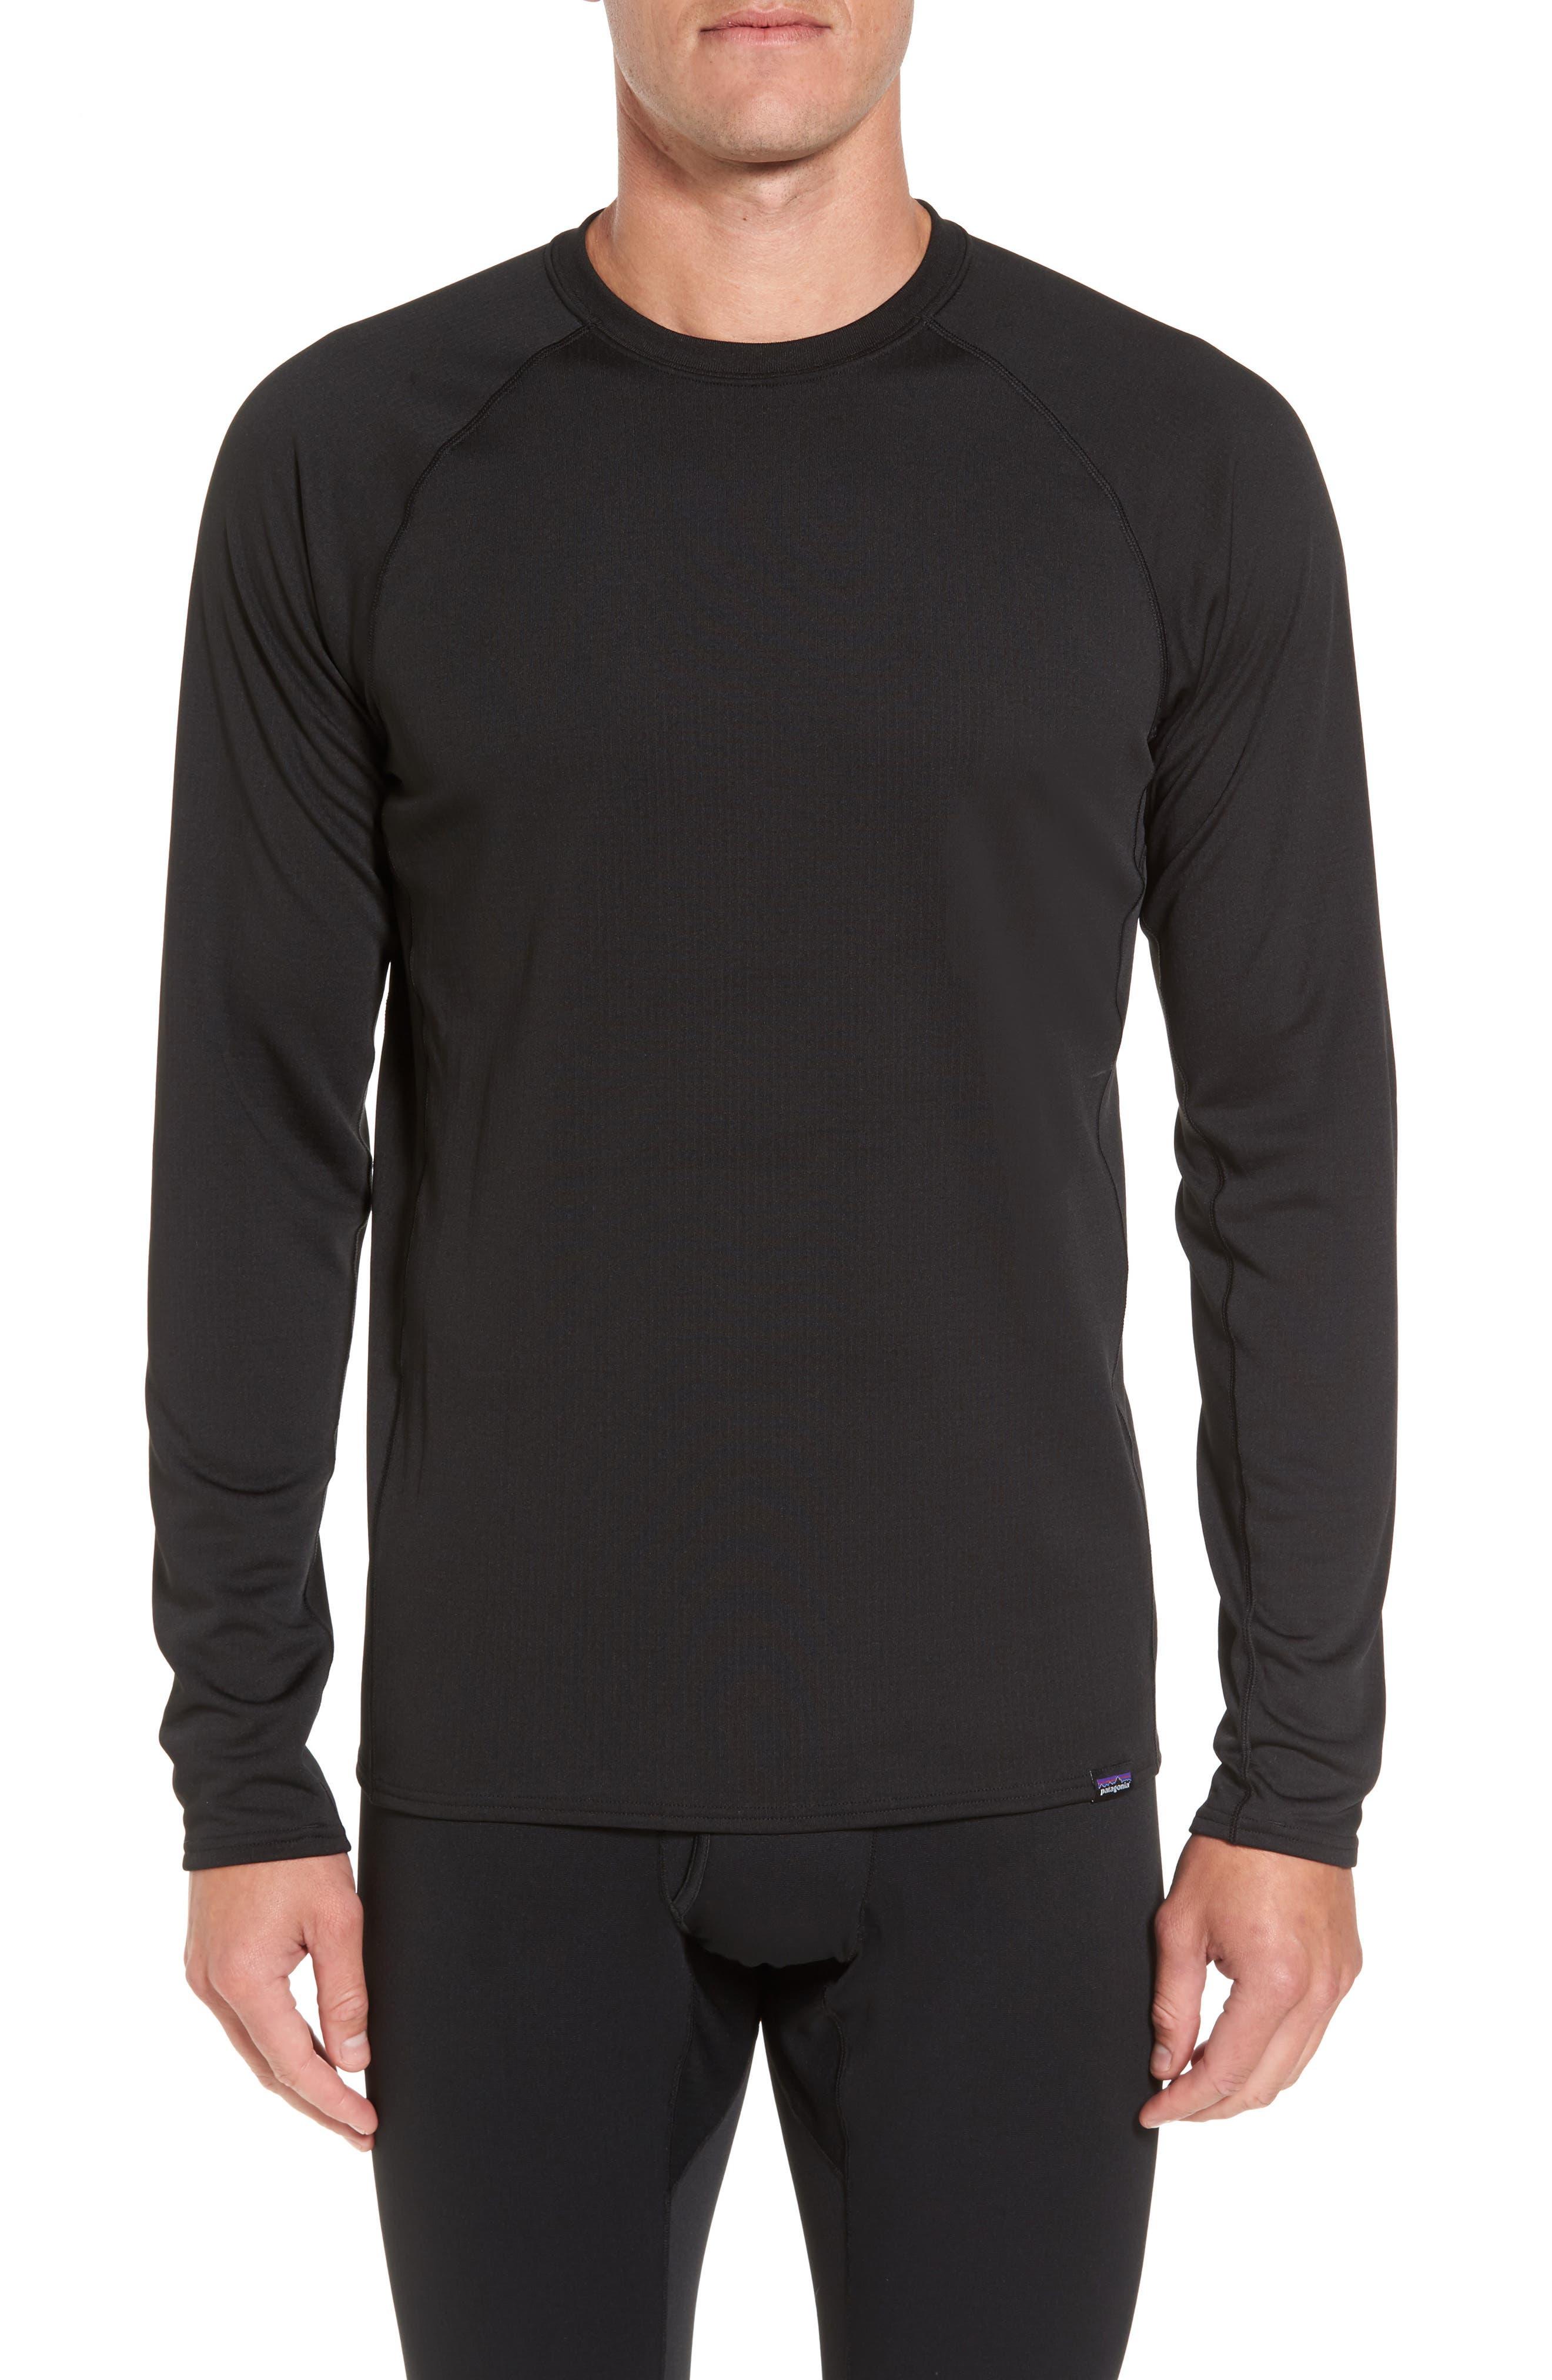 Capilene Midweight Base Layer T-Shirt,                         Main,                         color, 001